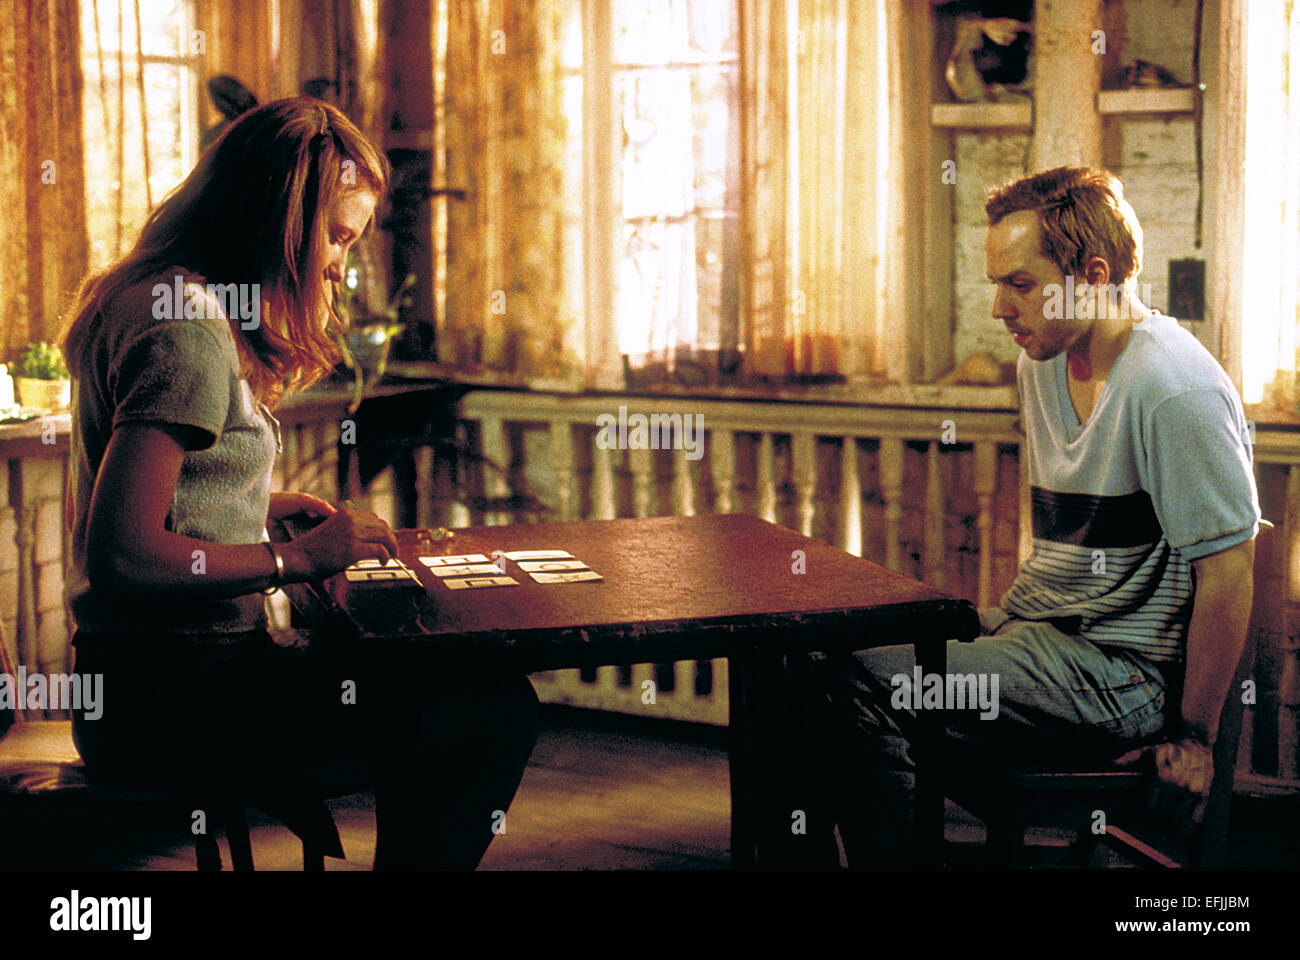 CATE BLANCHETT & GIOVANNI RIBISI THE GIFT (2000 Stock Photo ...